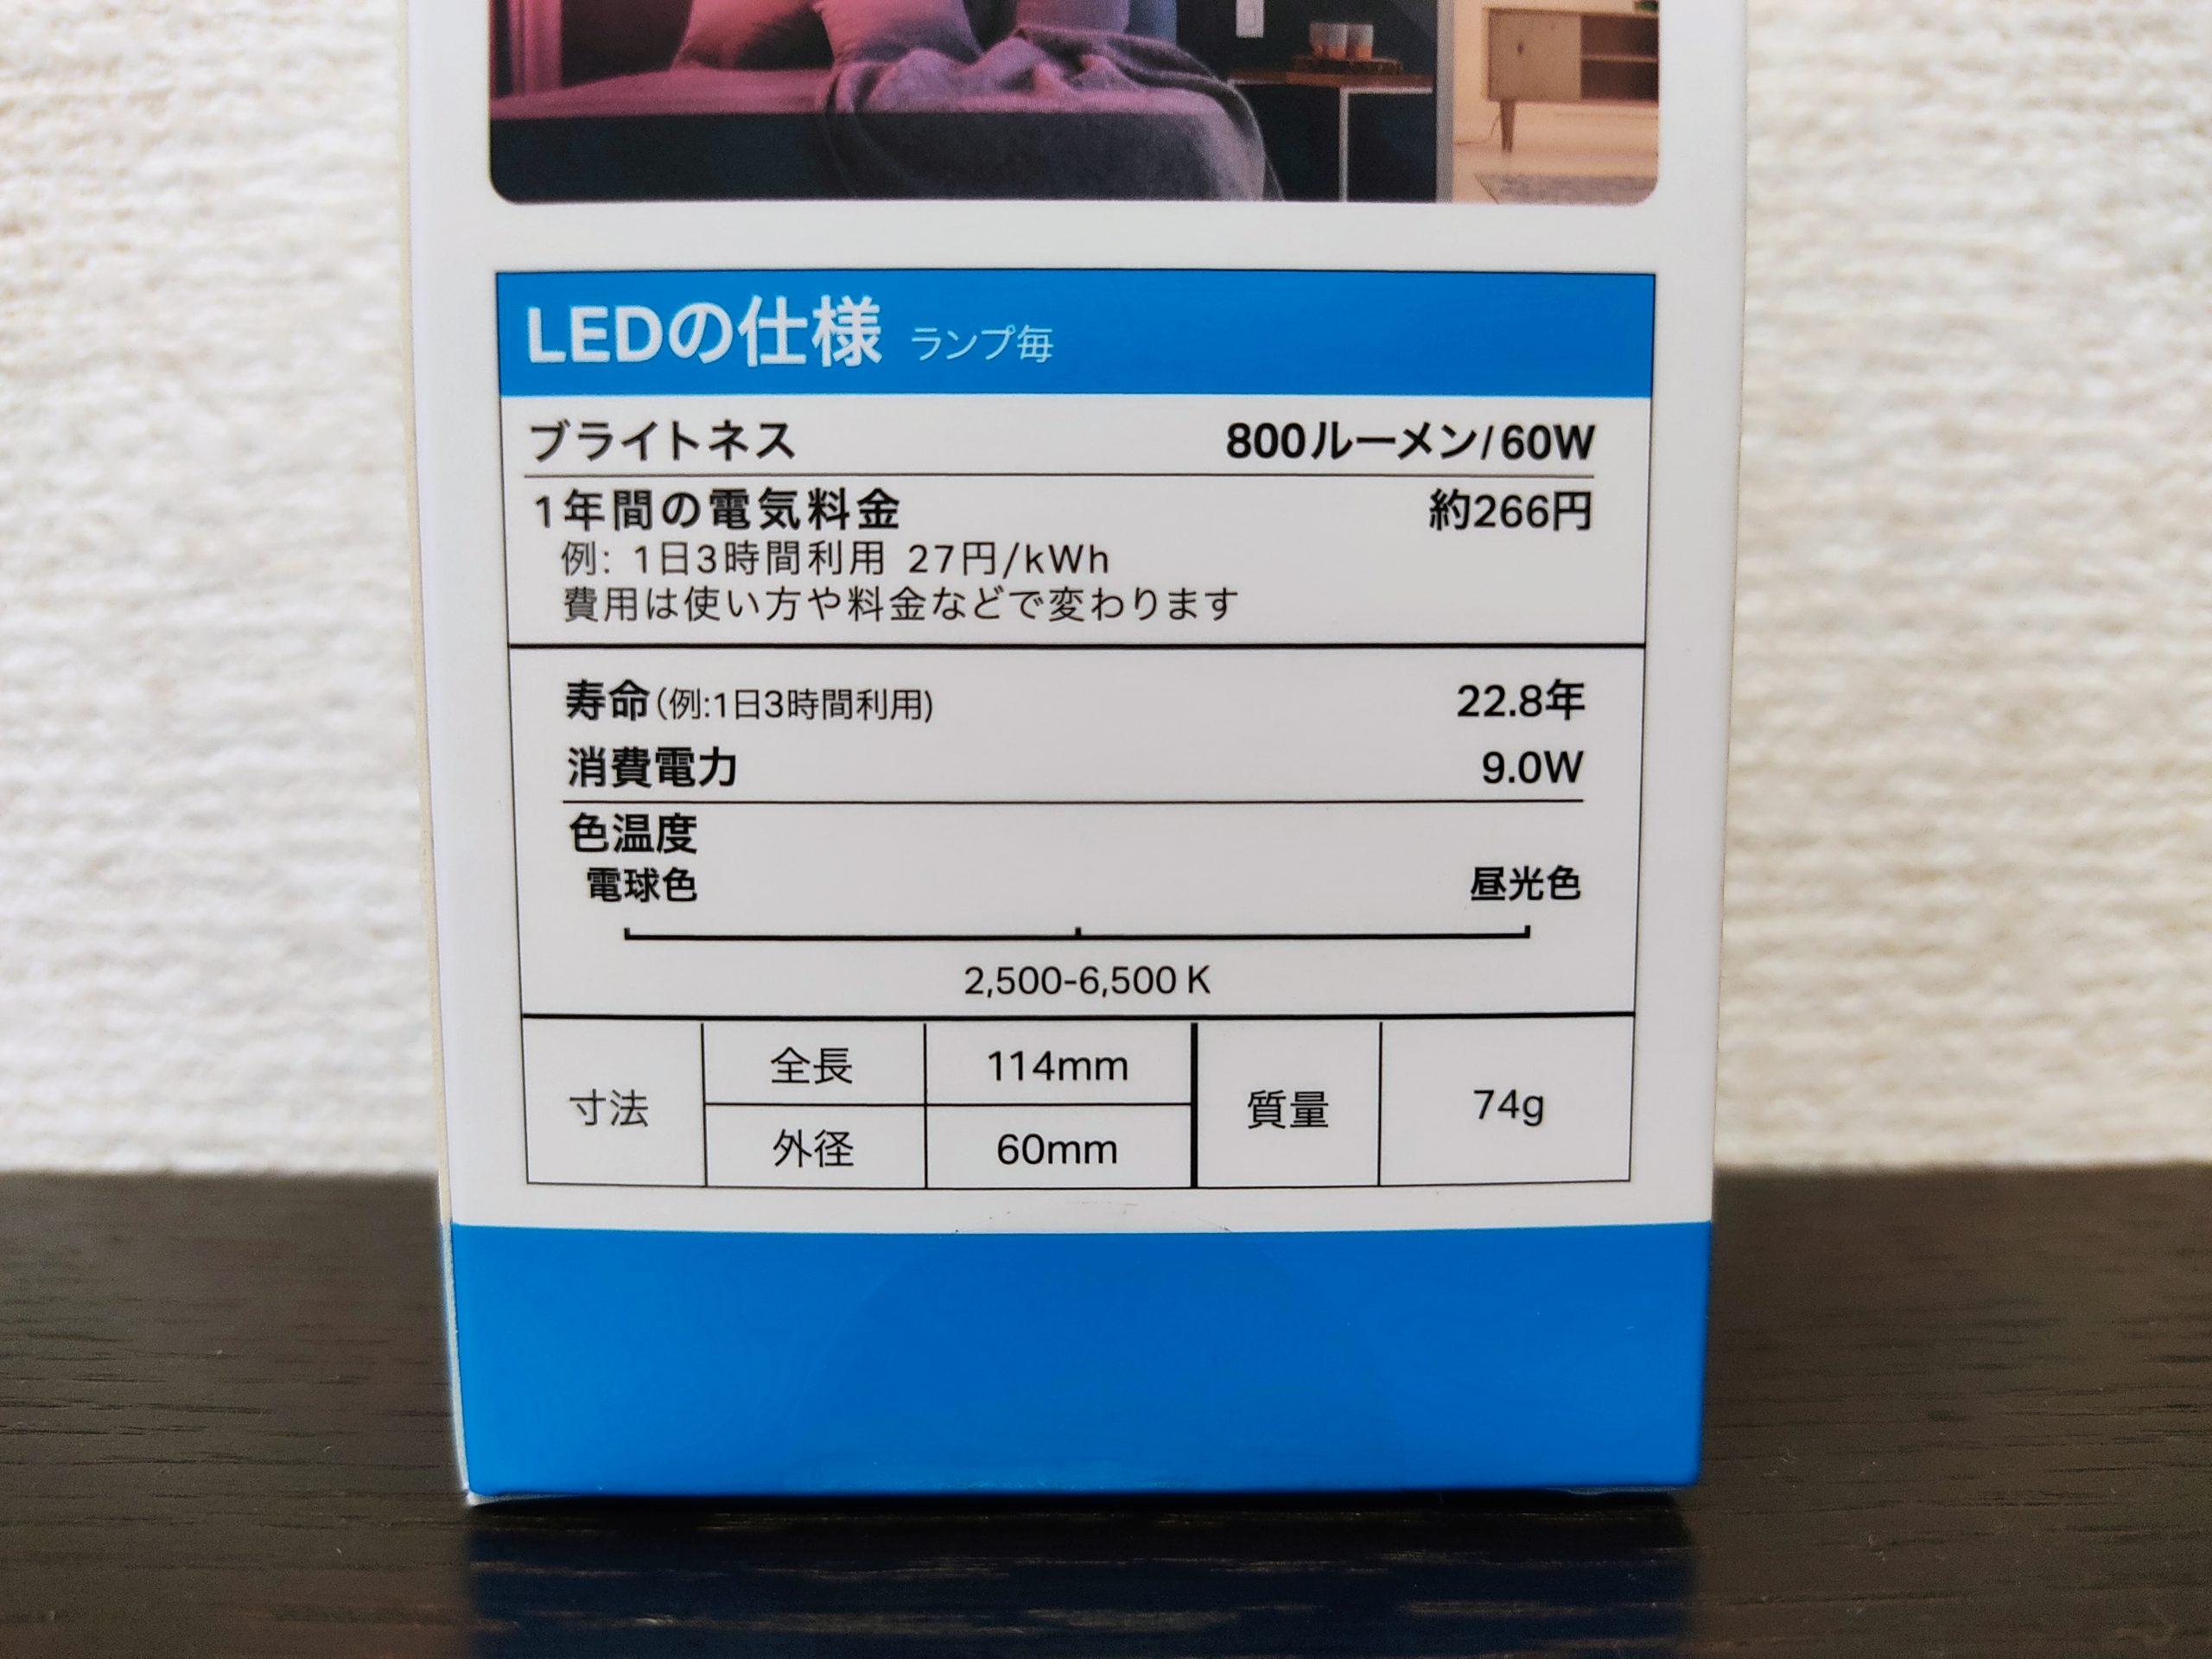 「Tapo L530E」のLEDの仕様